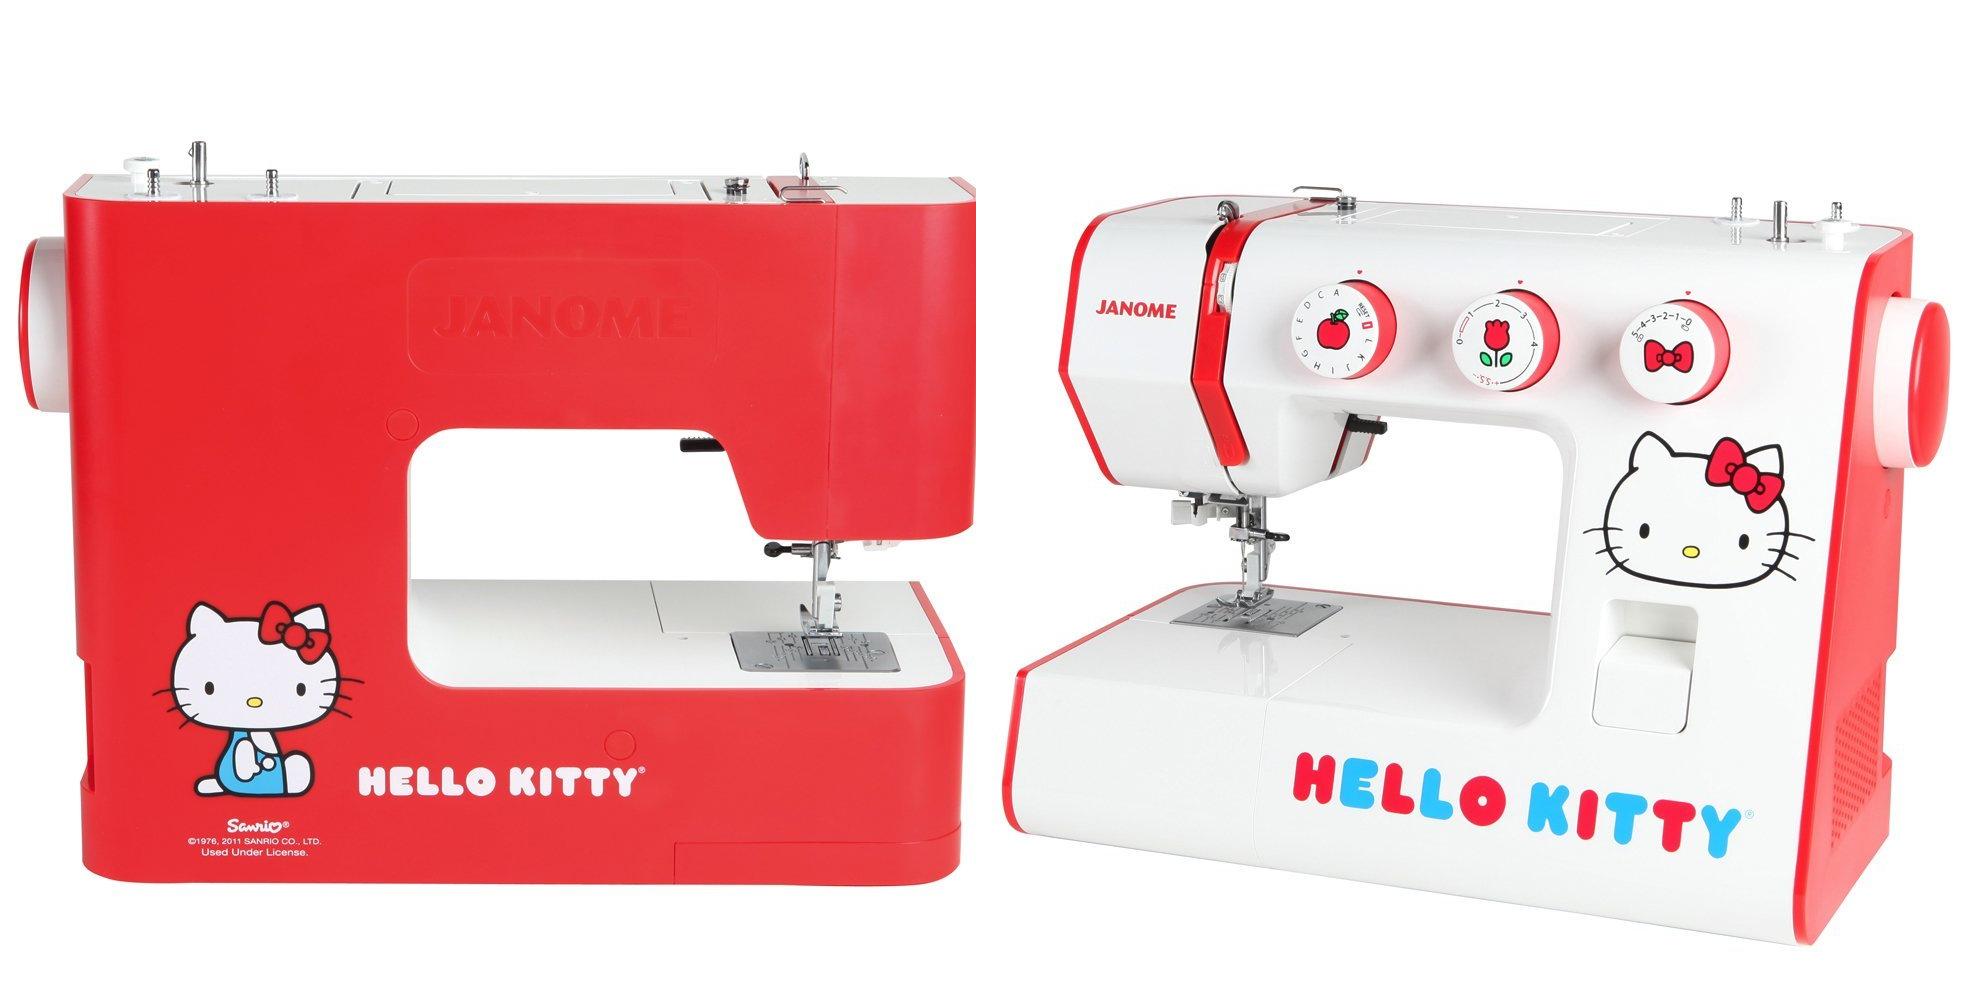 Hello Kitty Sewing Machine gift